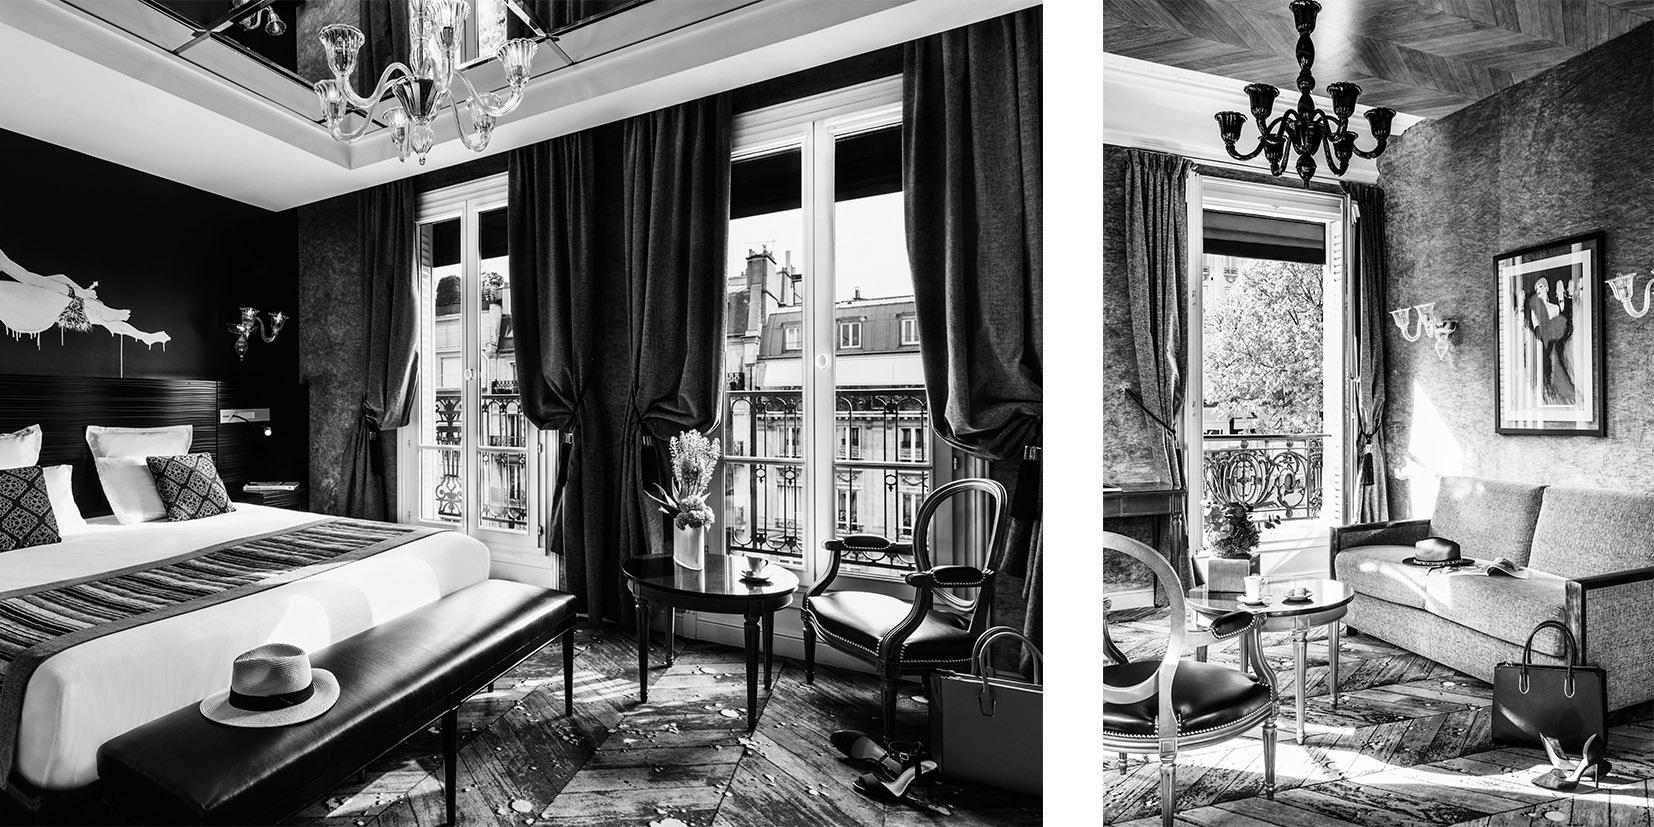 Maison Albar - Paris - 2017